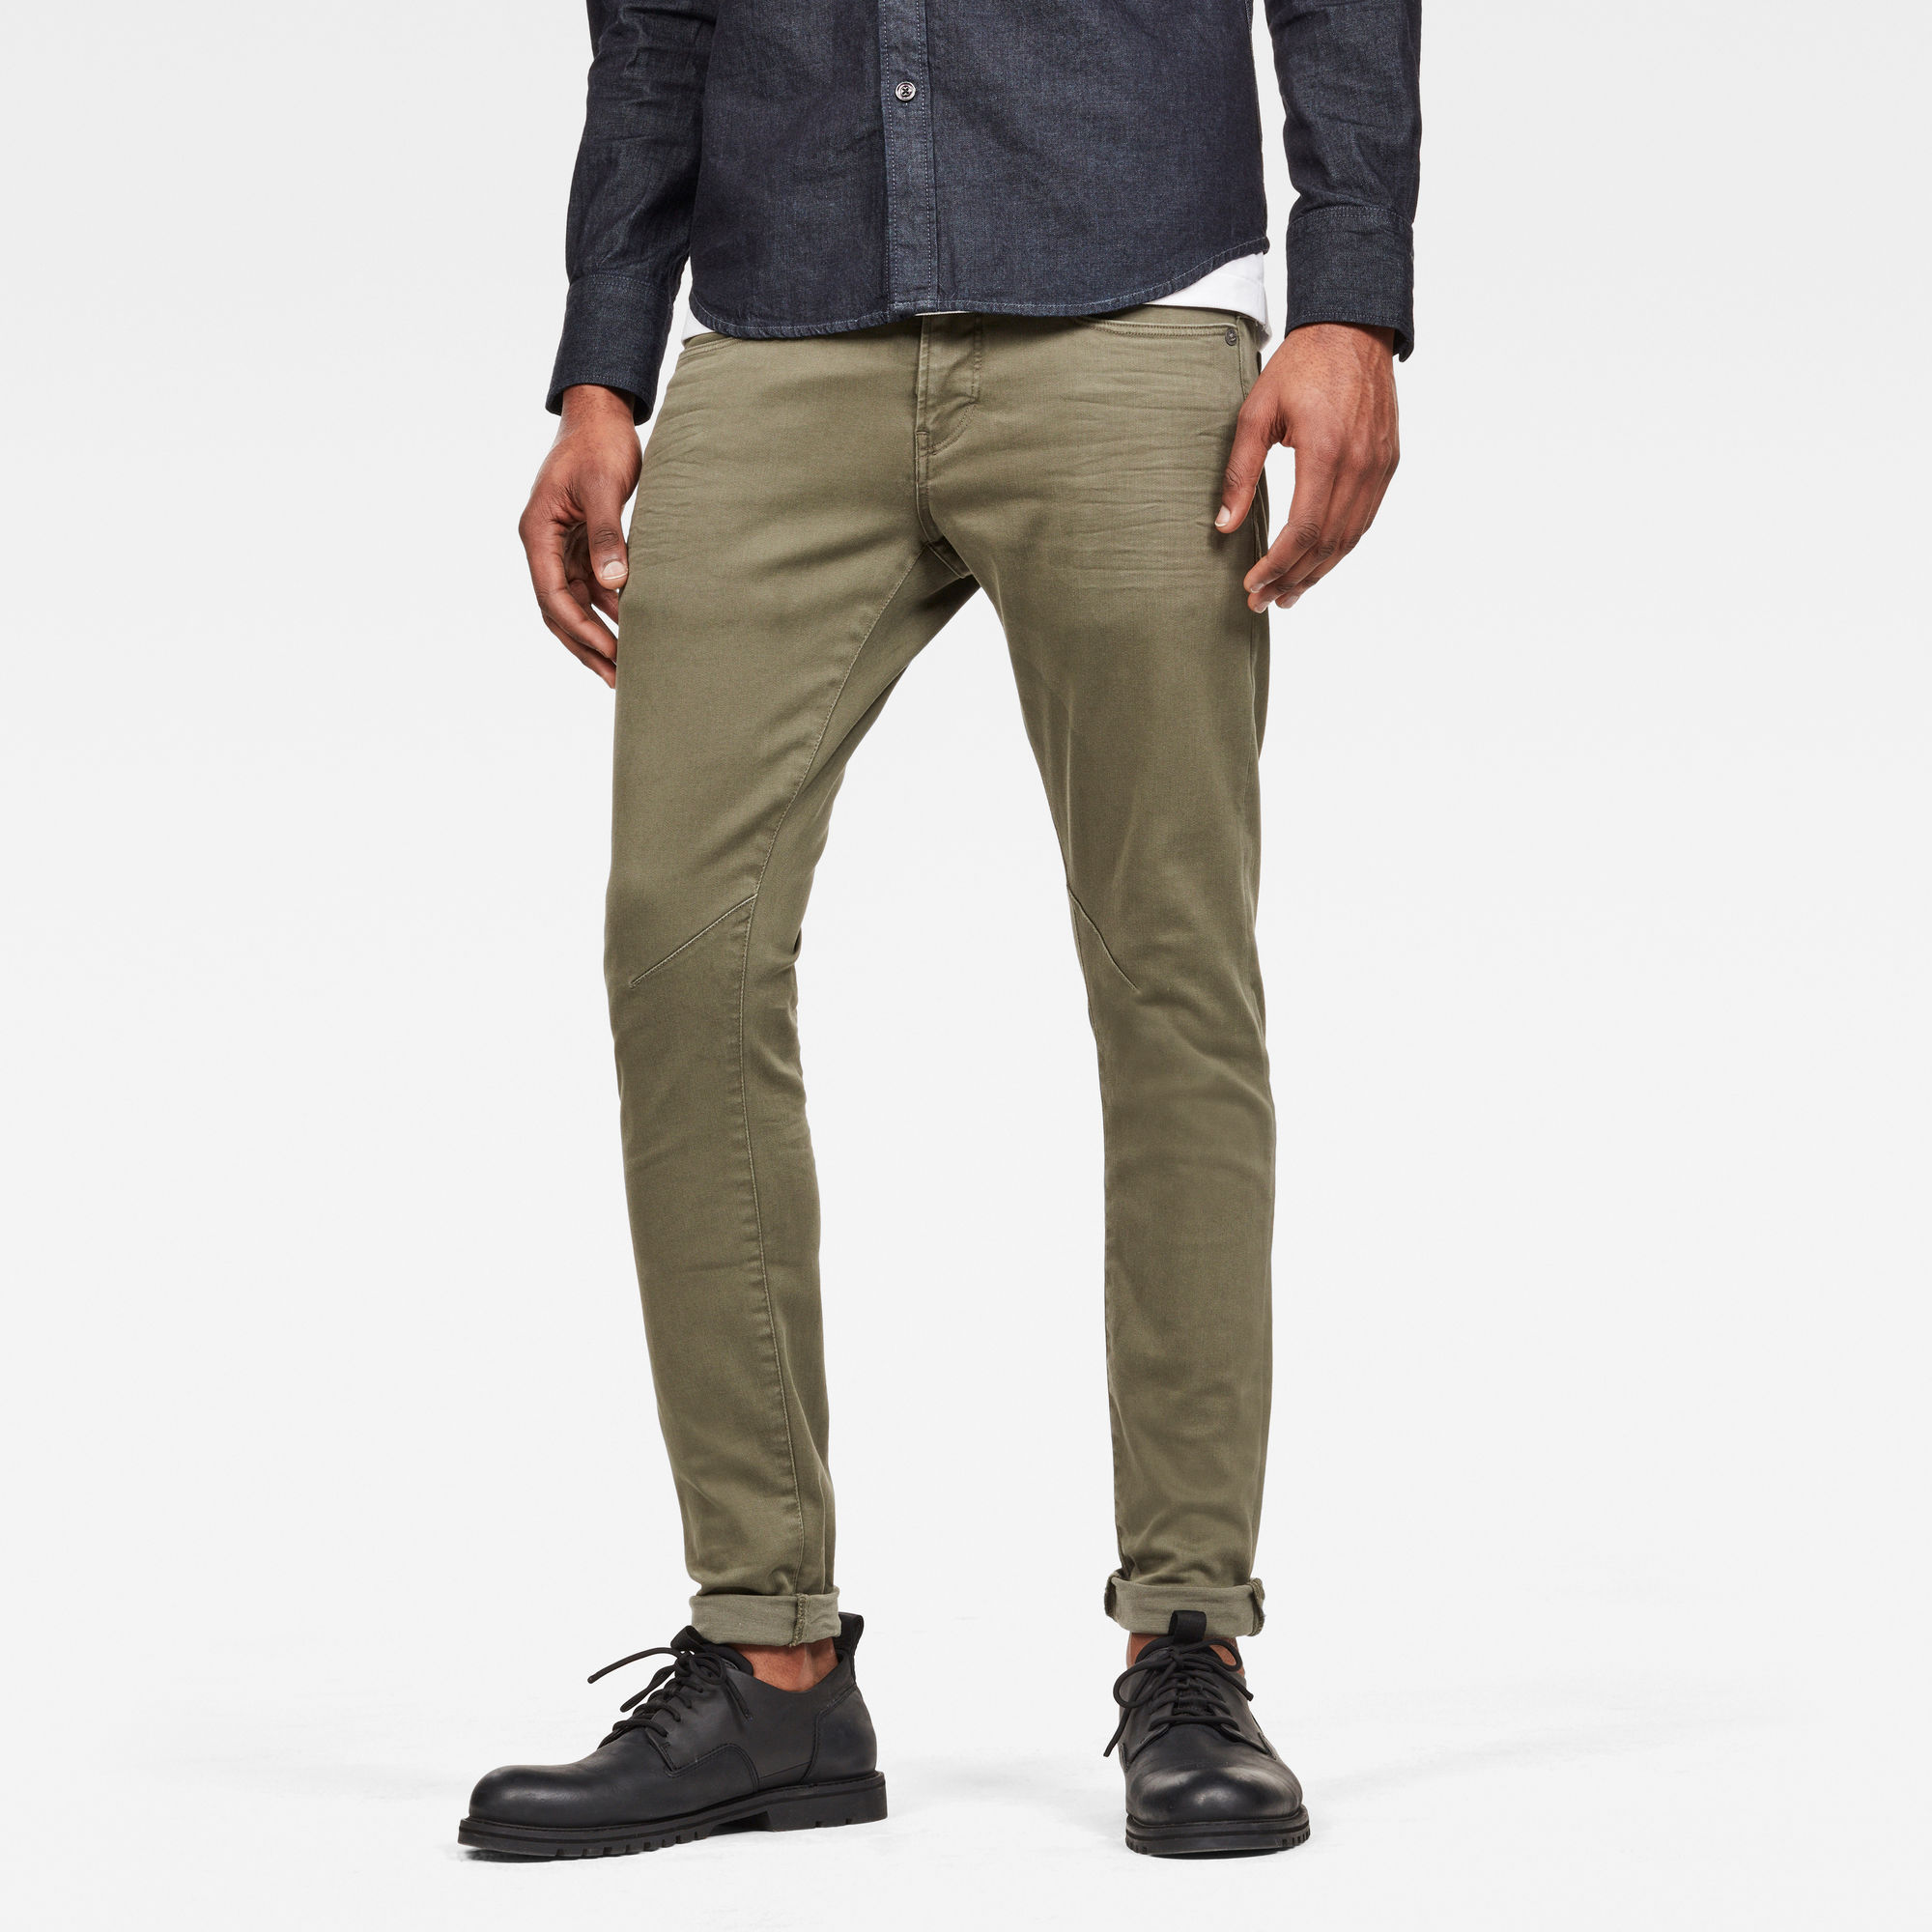 Van G Star Raw D-Staq 5-Pocket Skinny Colored Jeans Prijsvergelijk nu!